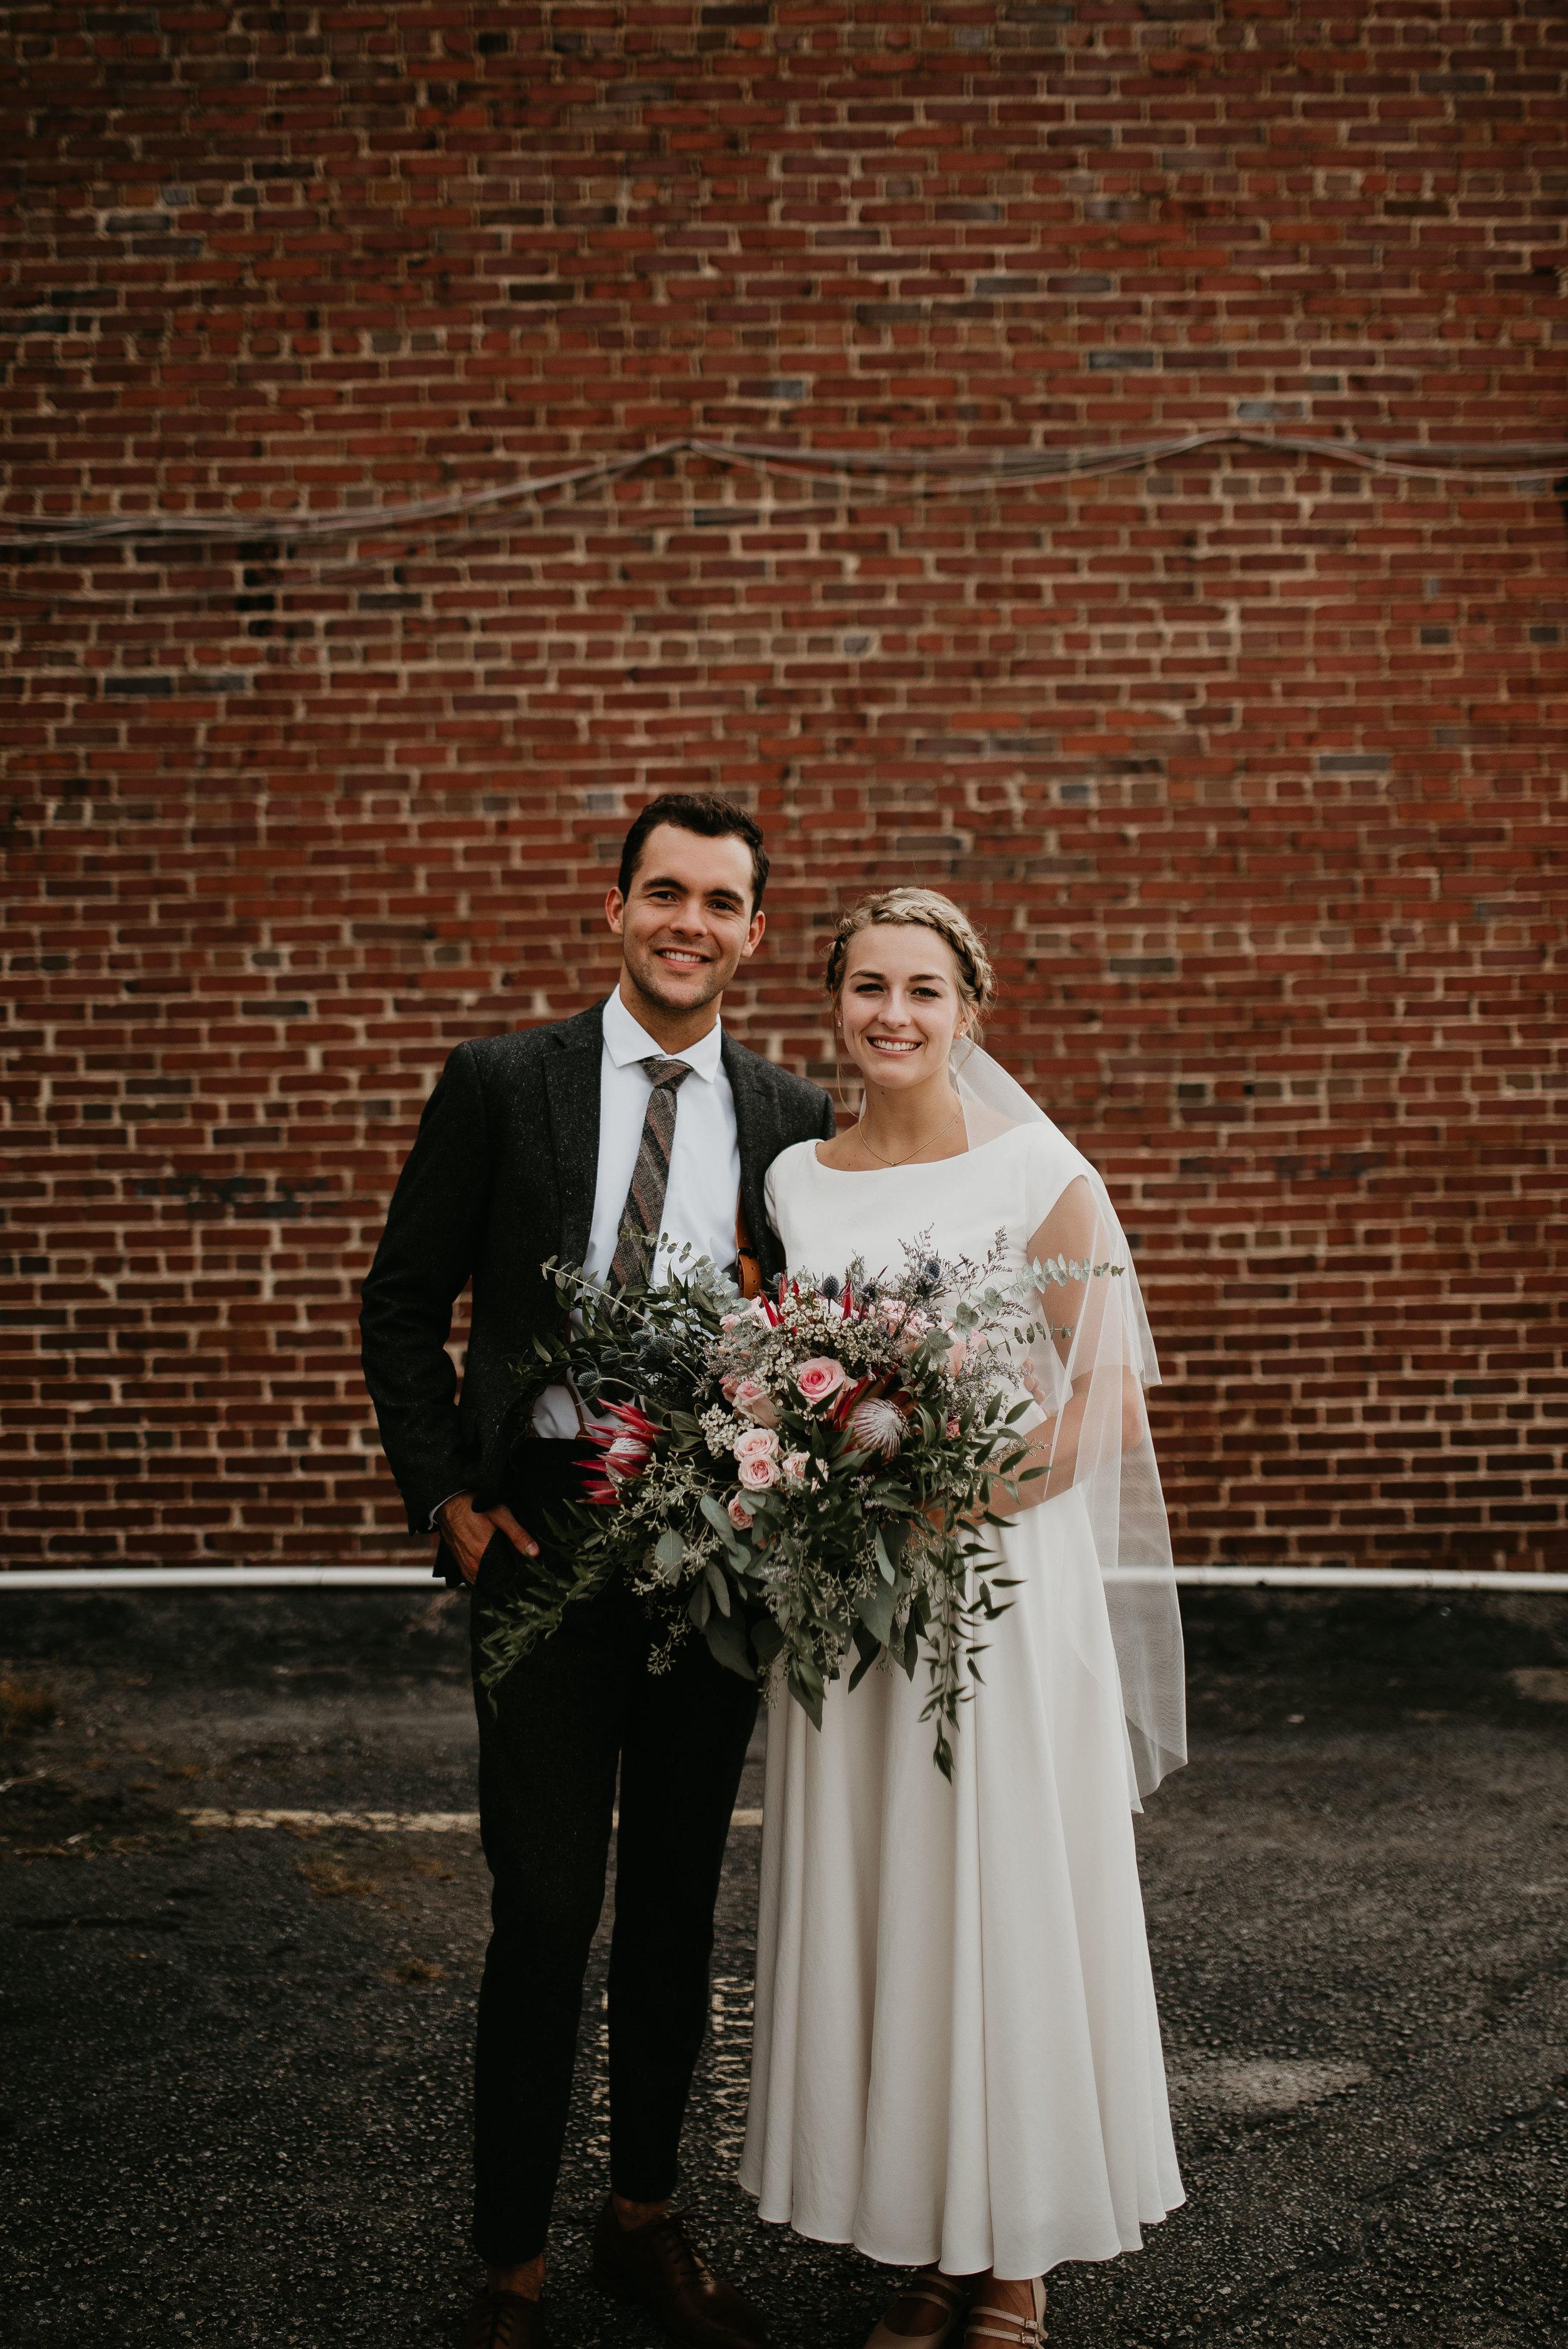 Couple elopement in Atlanta, GA